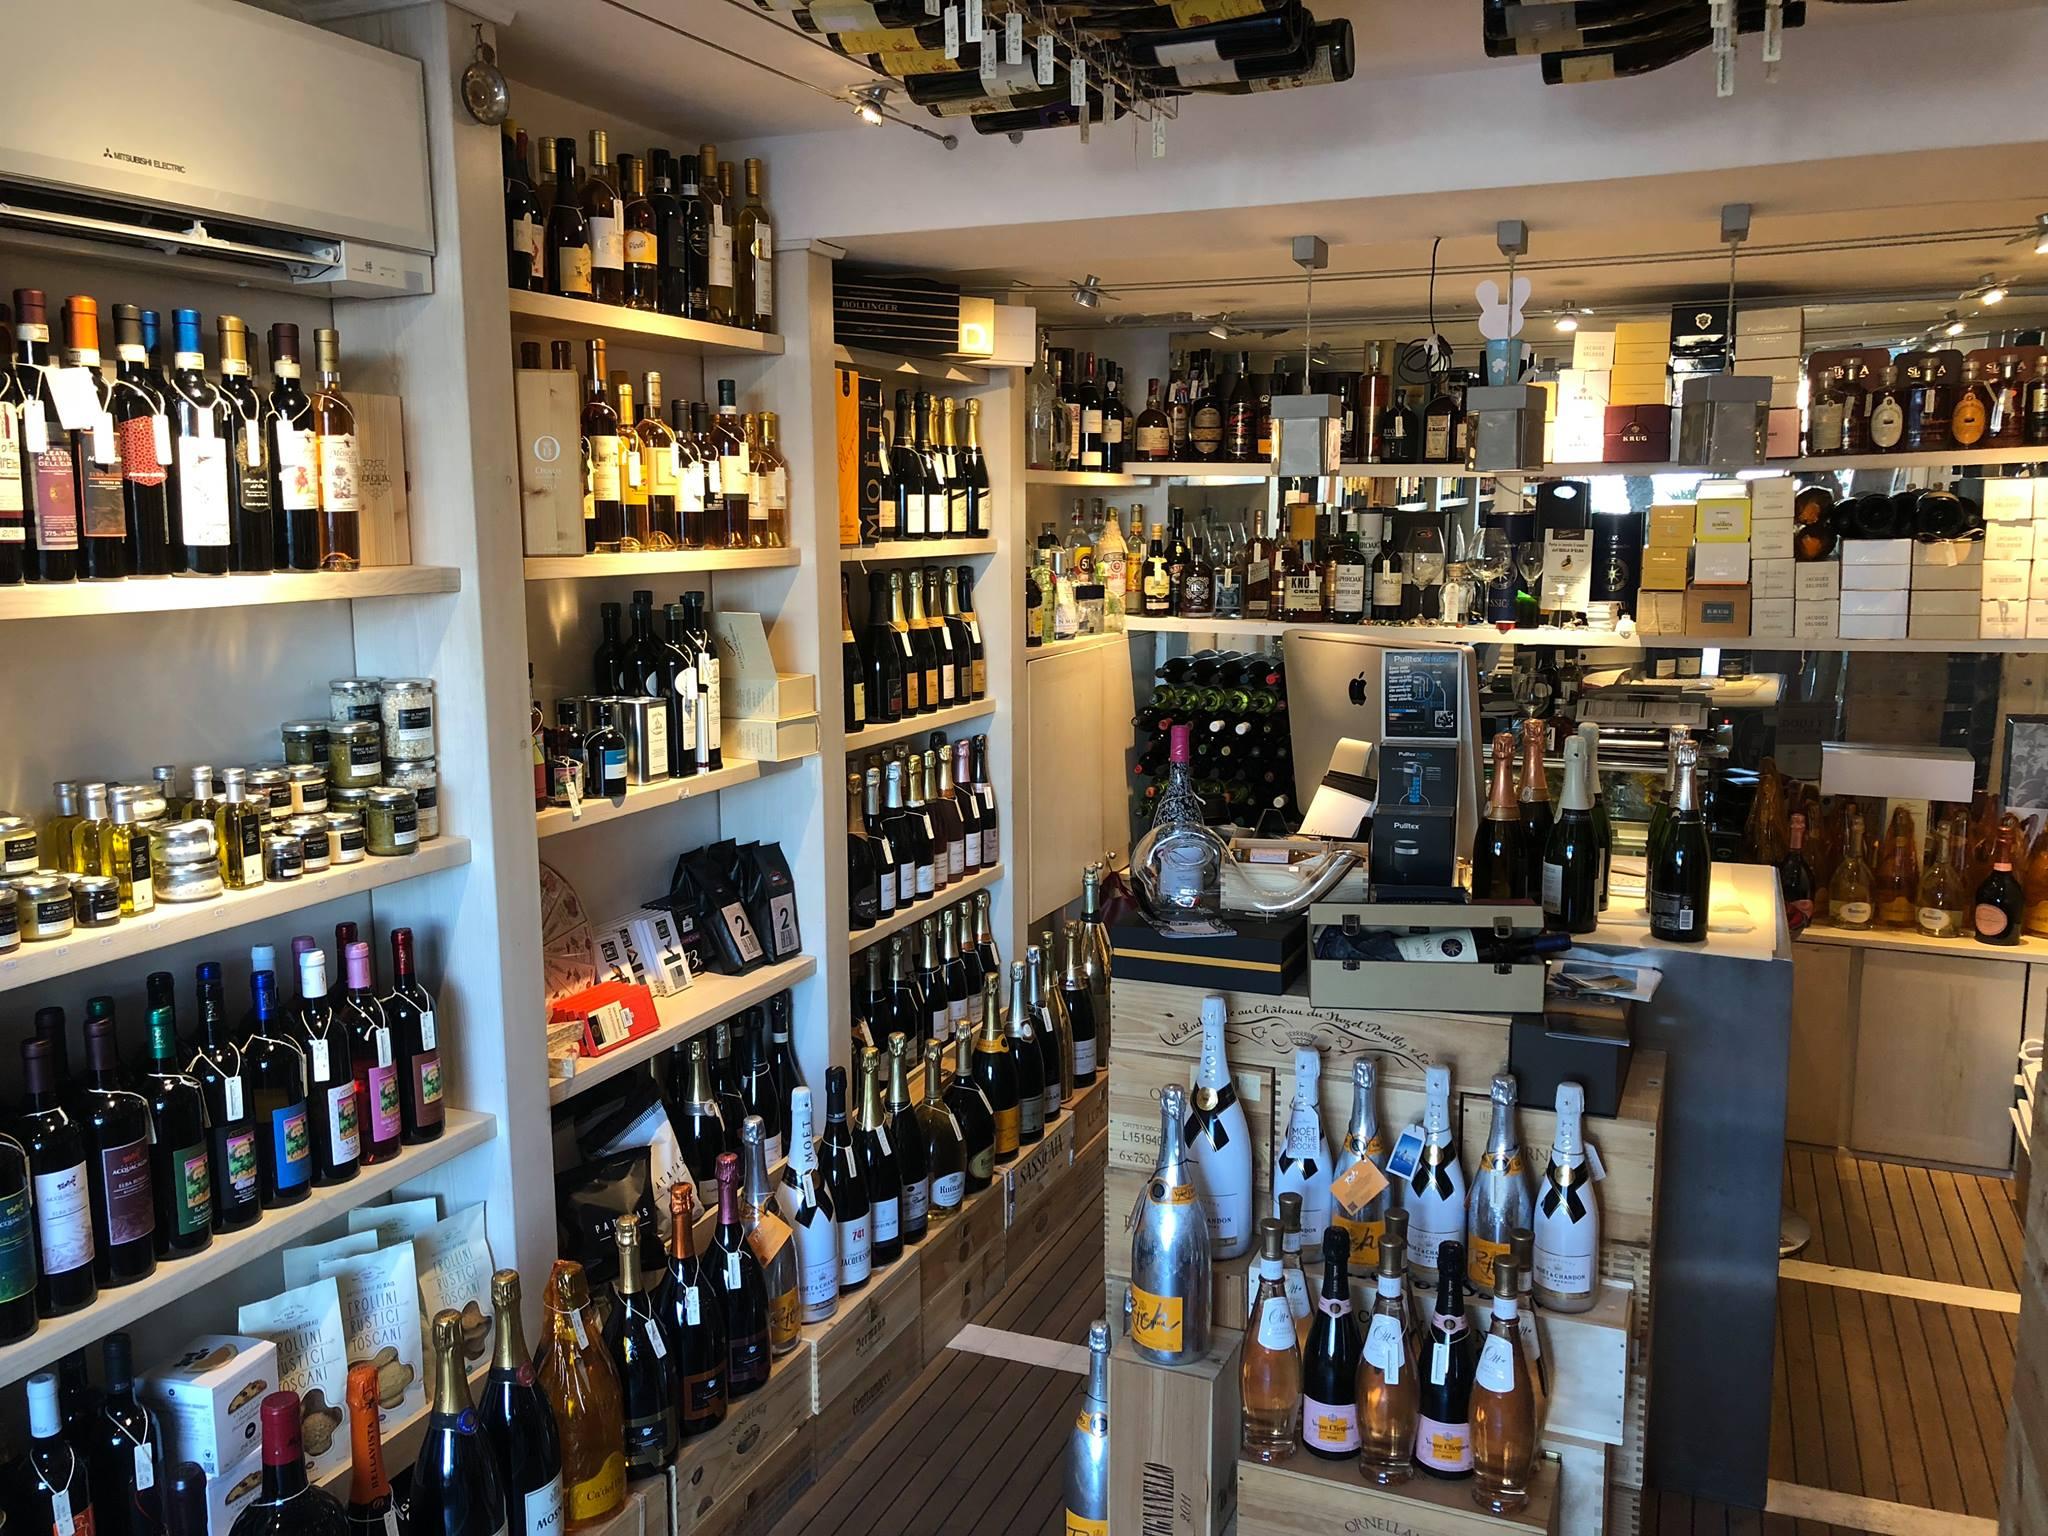 Calata Mazzini 15 – Wines & Selections